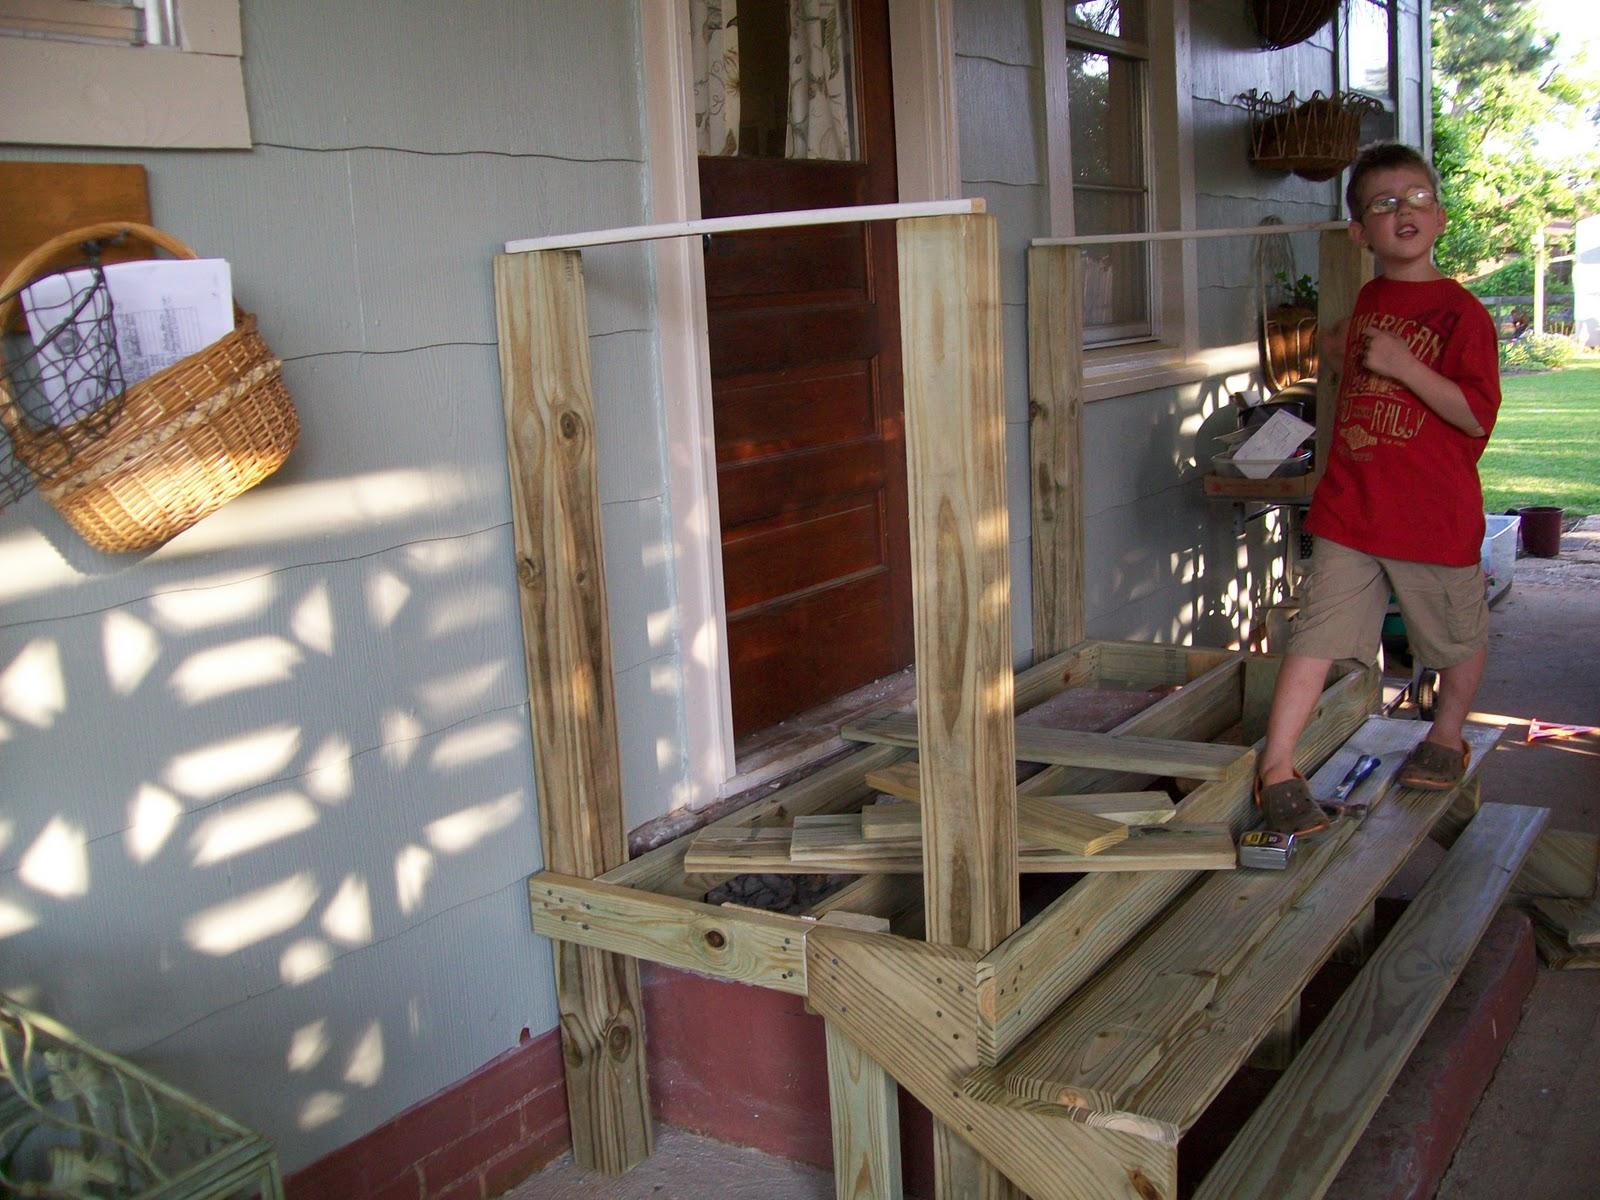 Build Wood Steps Over Concrete Steps Pdf Woodworking | Wood Stairs Over Concrete | Stair Stringers | Composite Decking | Cement | Front Porch | Stoop